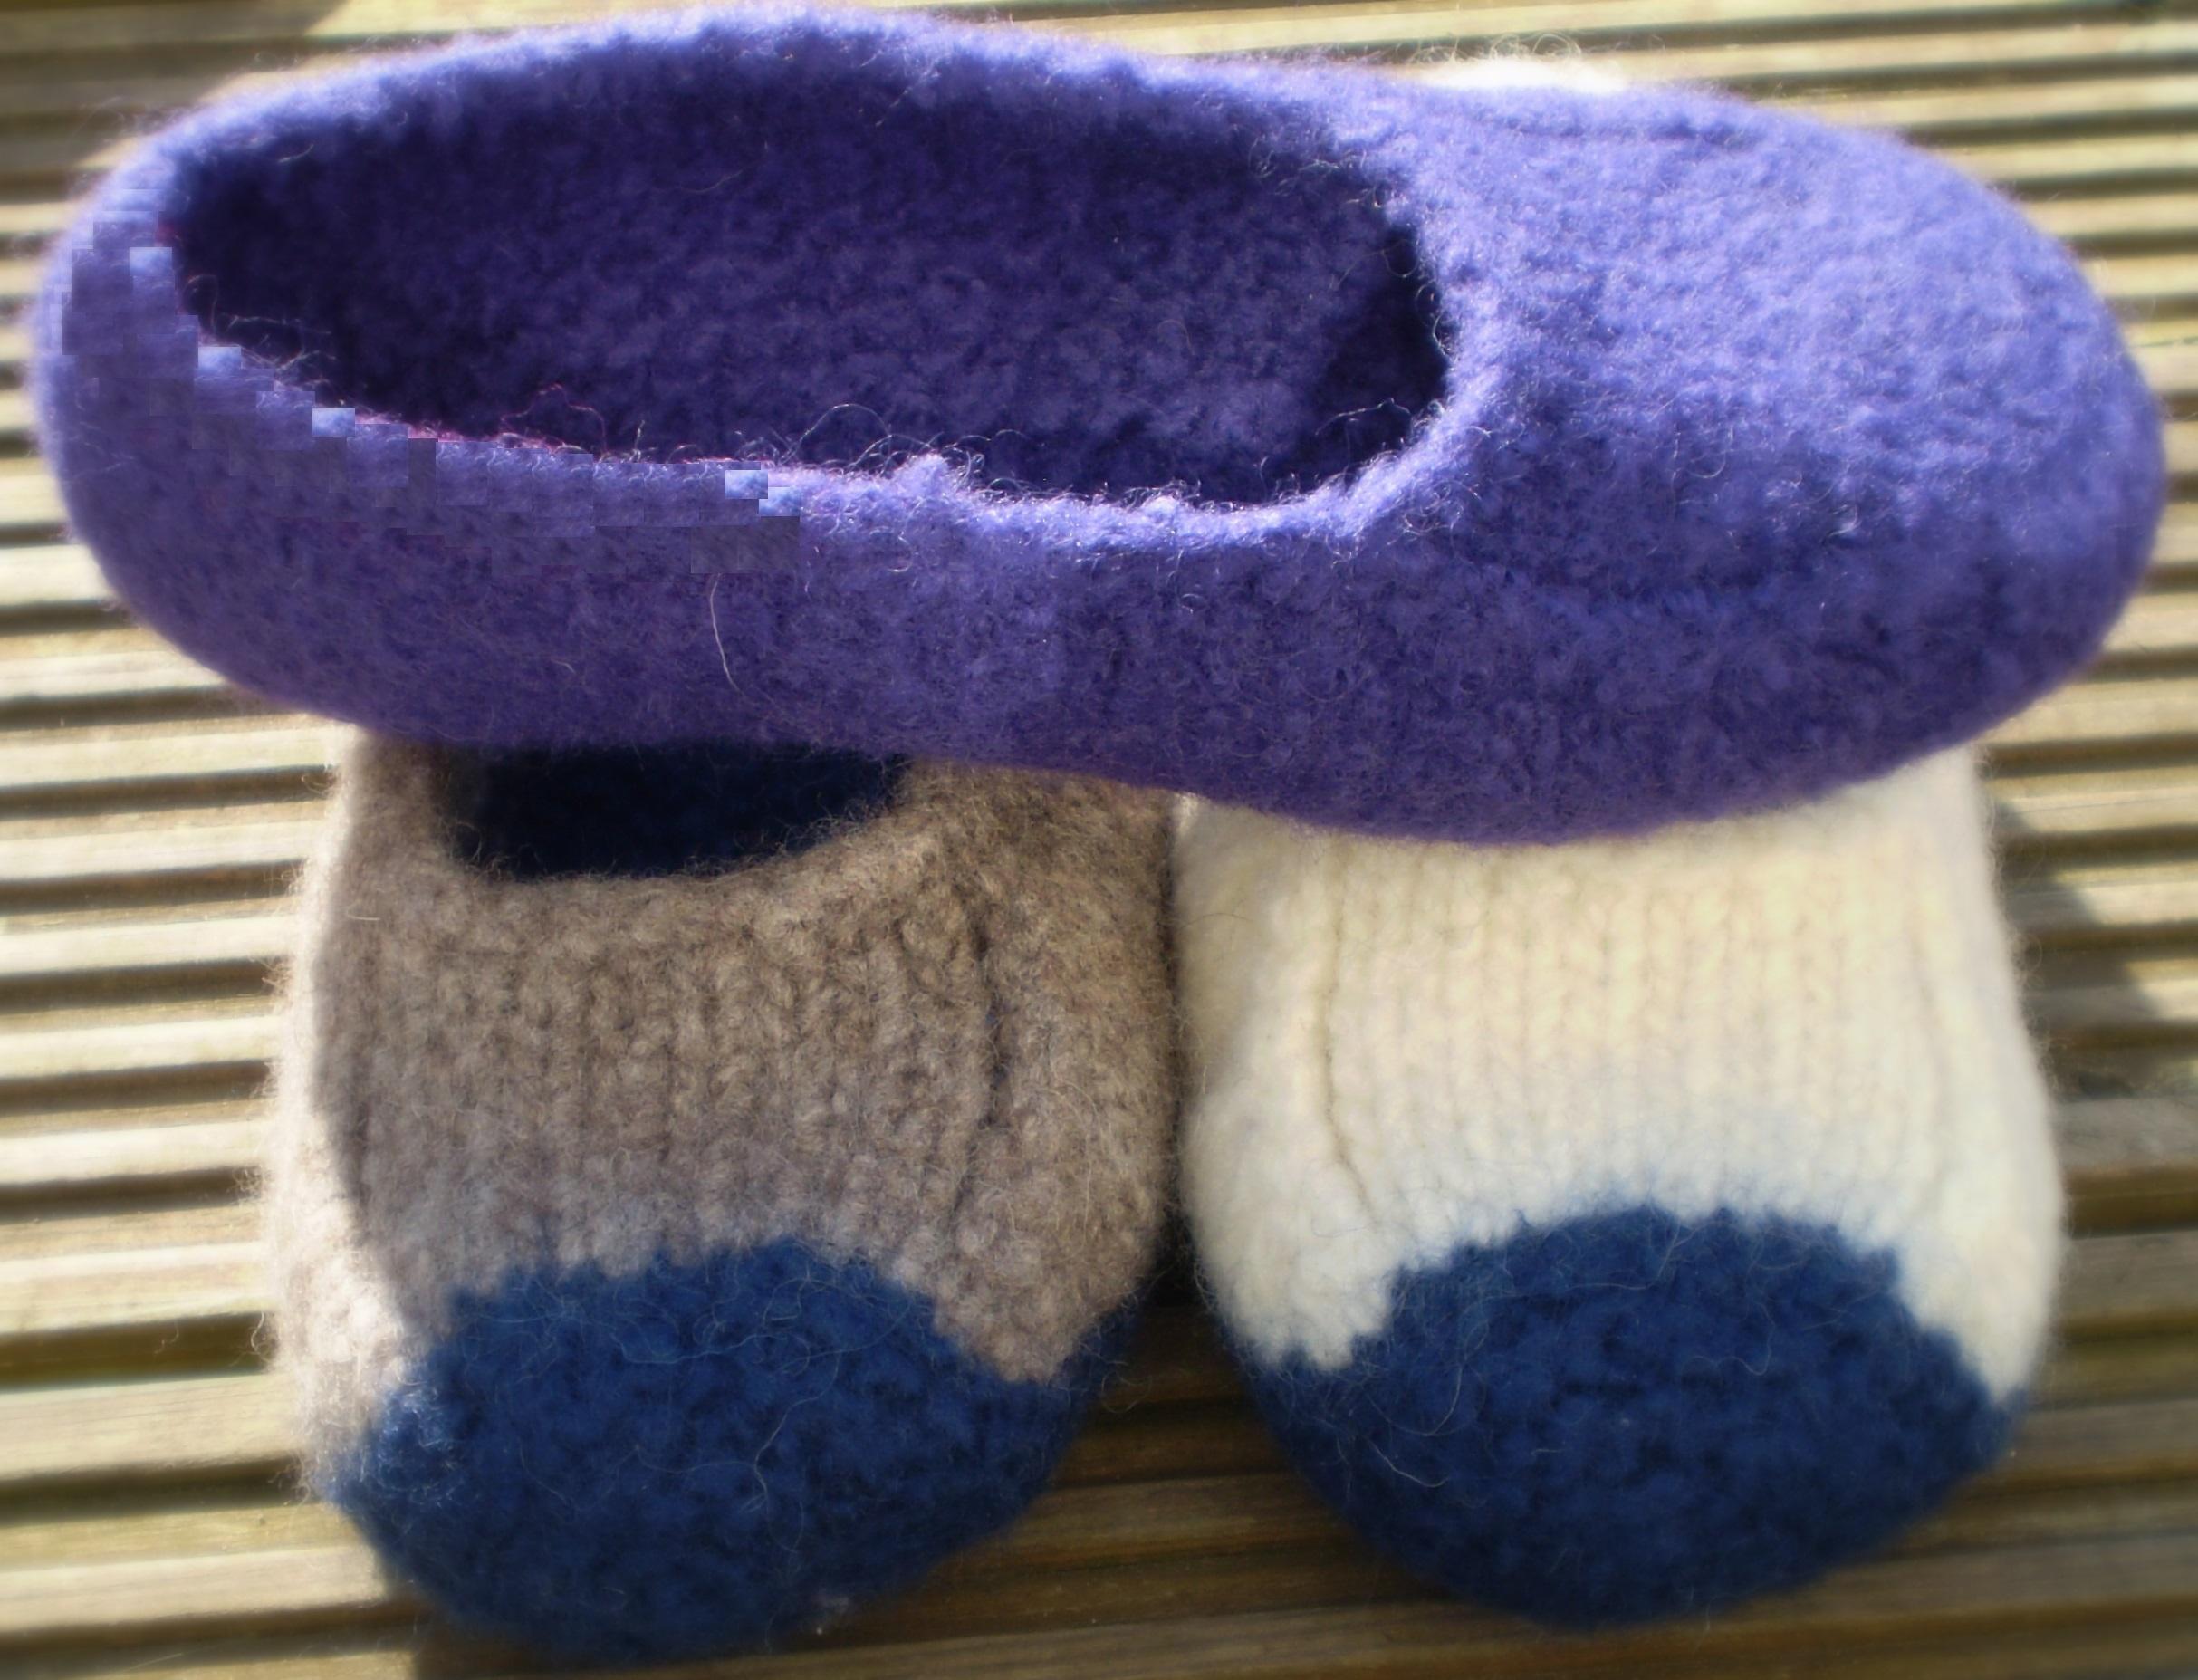 Duffers – Original – Knit & Purl Makes